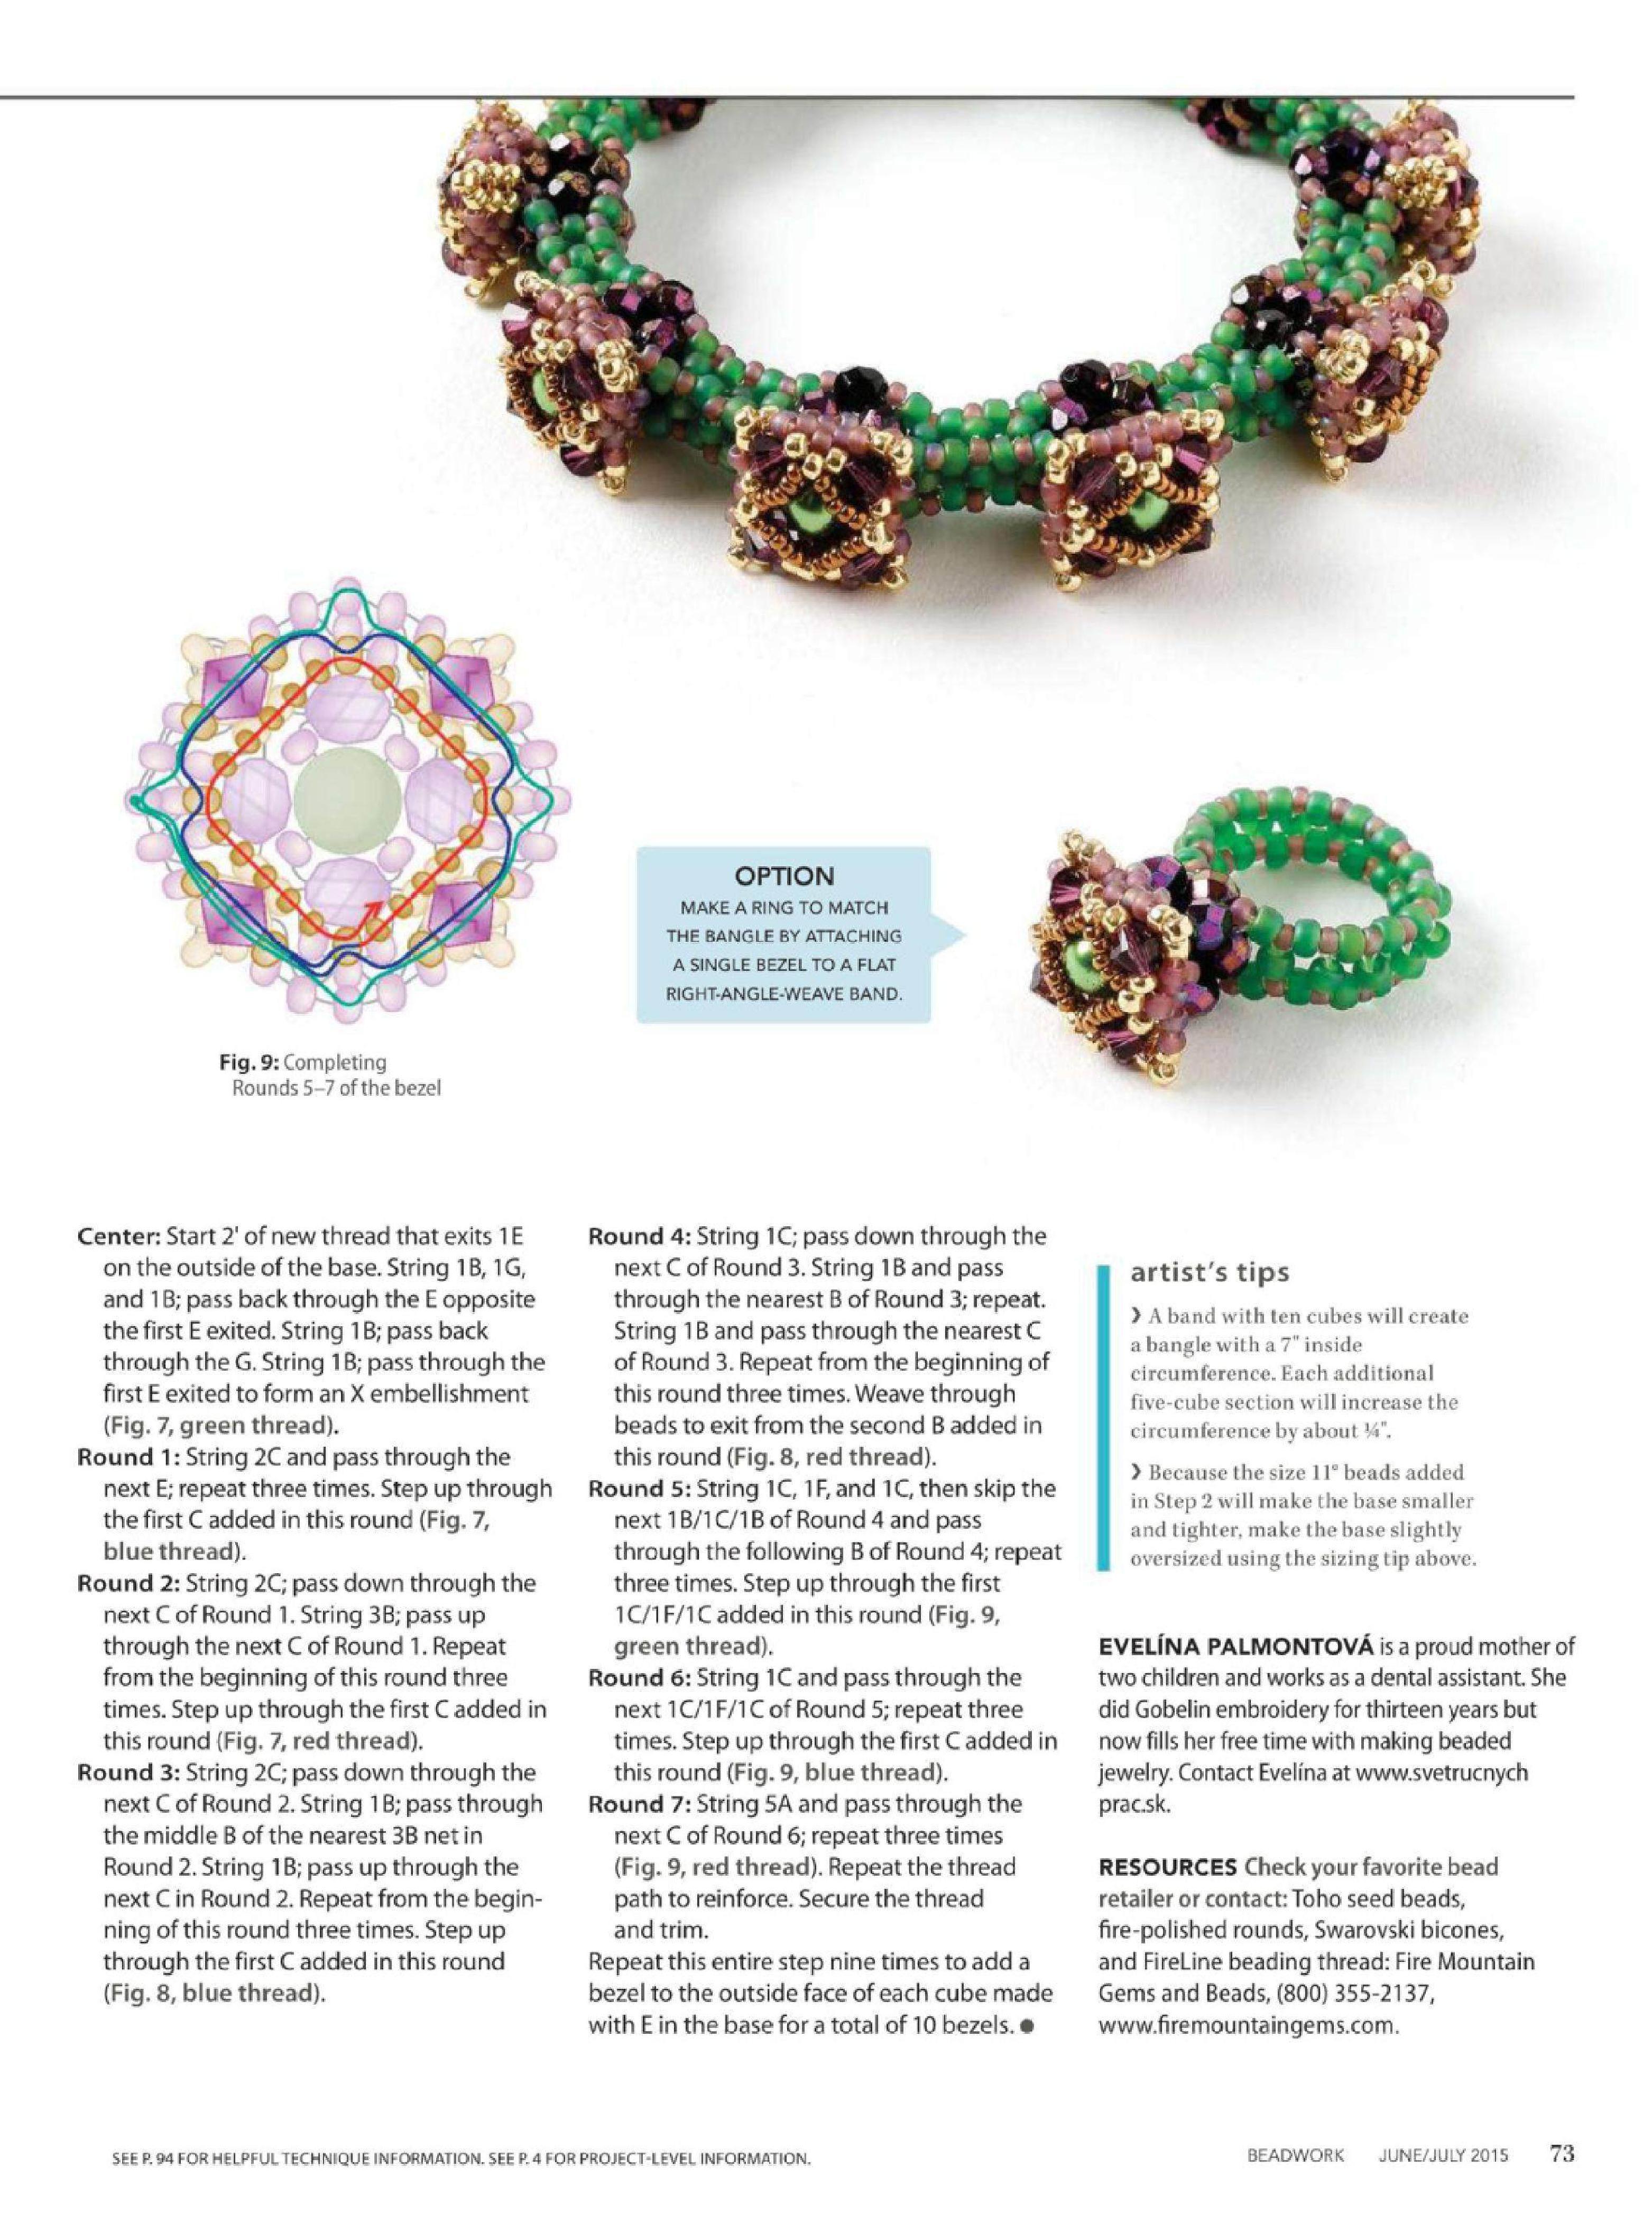 HIDDEN GEMS Bracelet - FREE Tutorial. Page 3 of 3